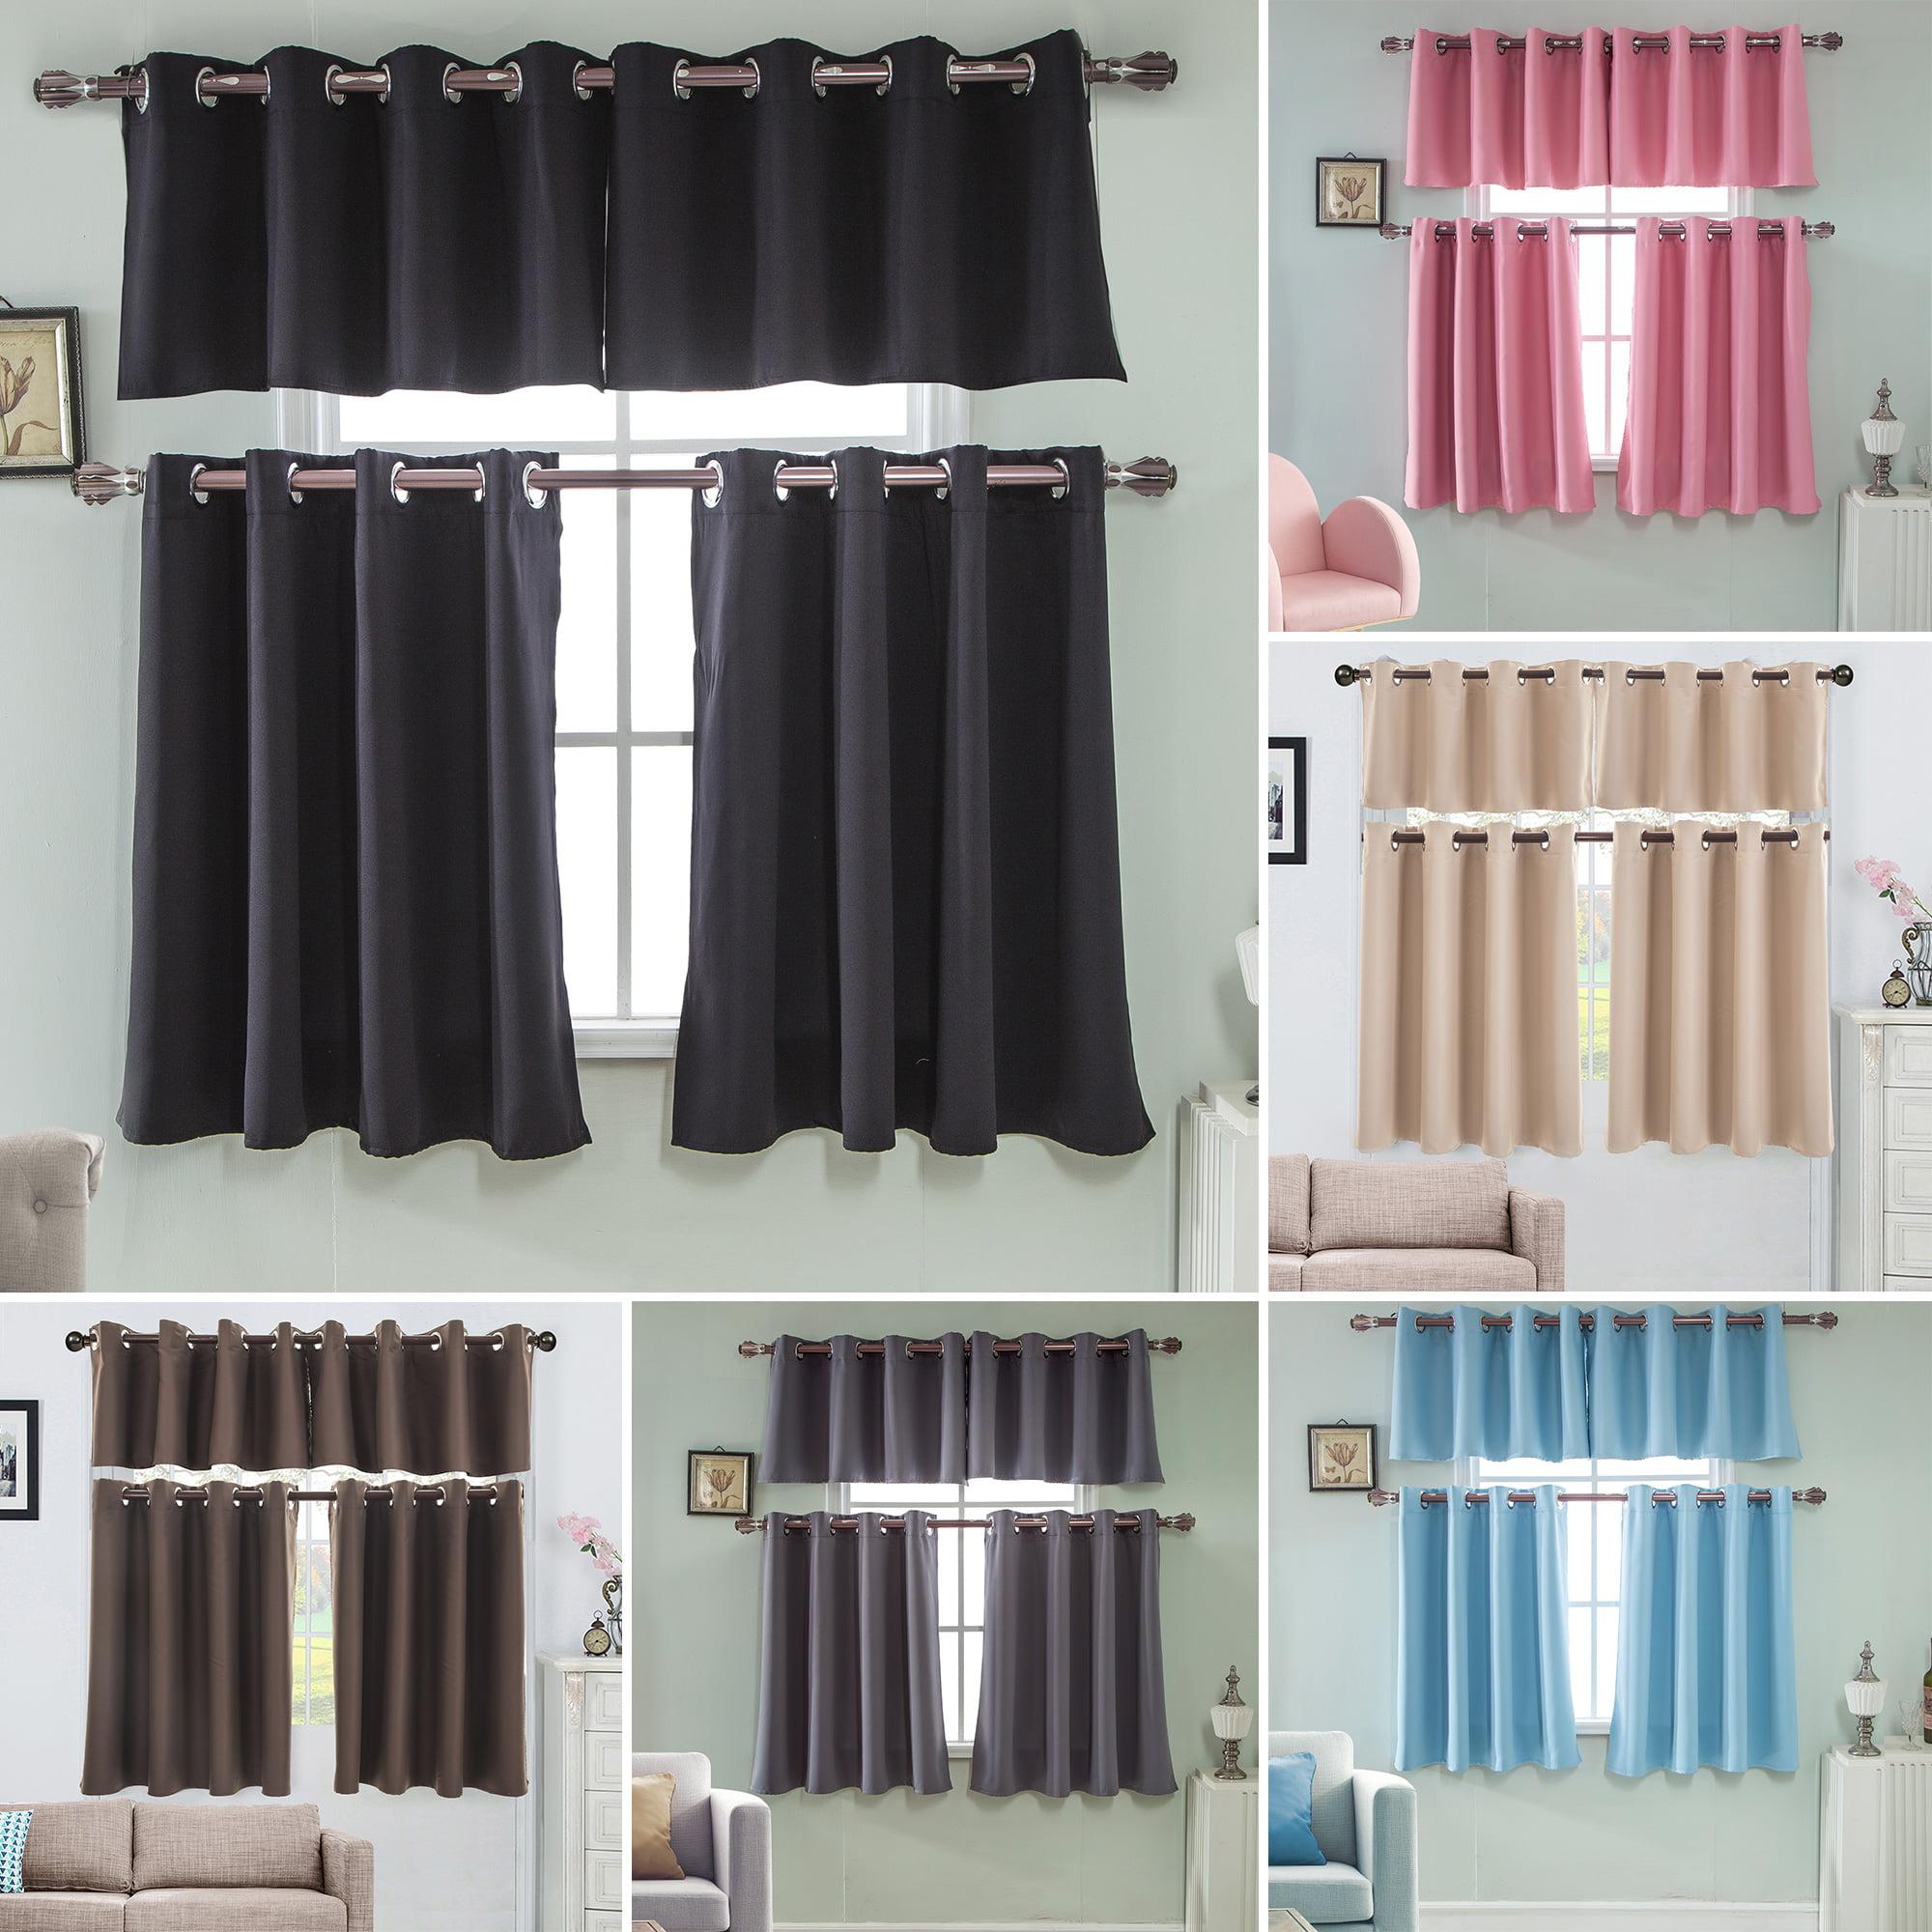 solid blackout short curtains panel, energy saving room darkening grommet top window curtain